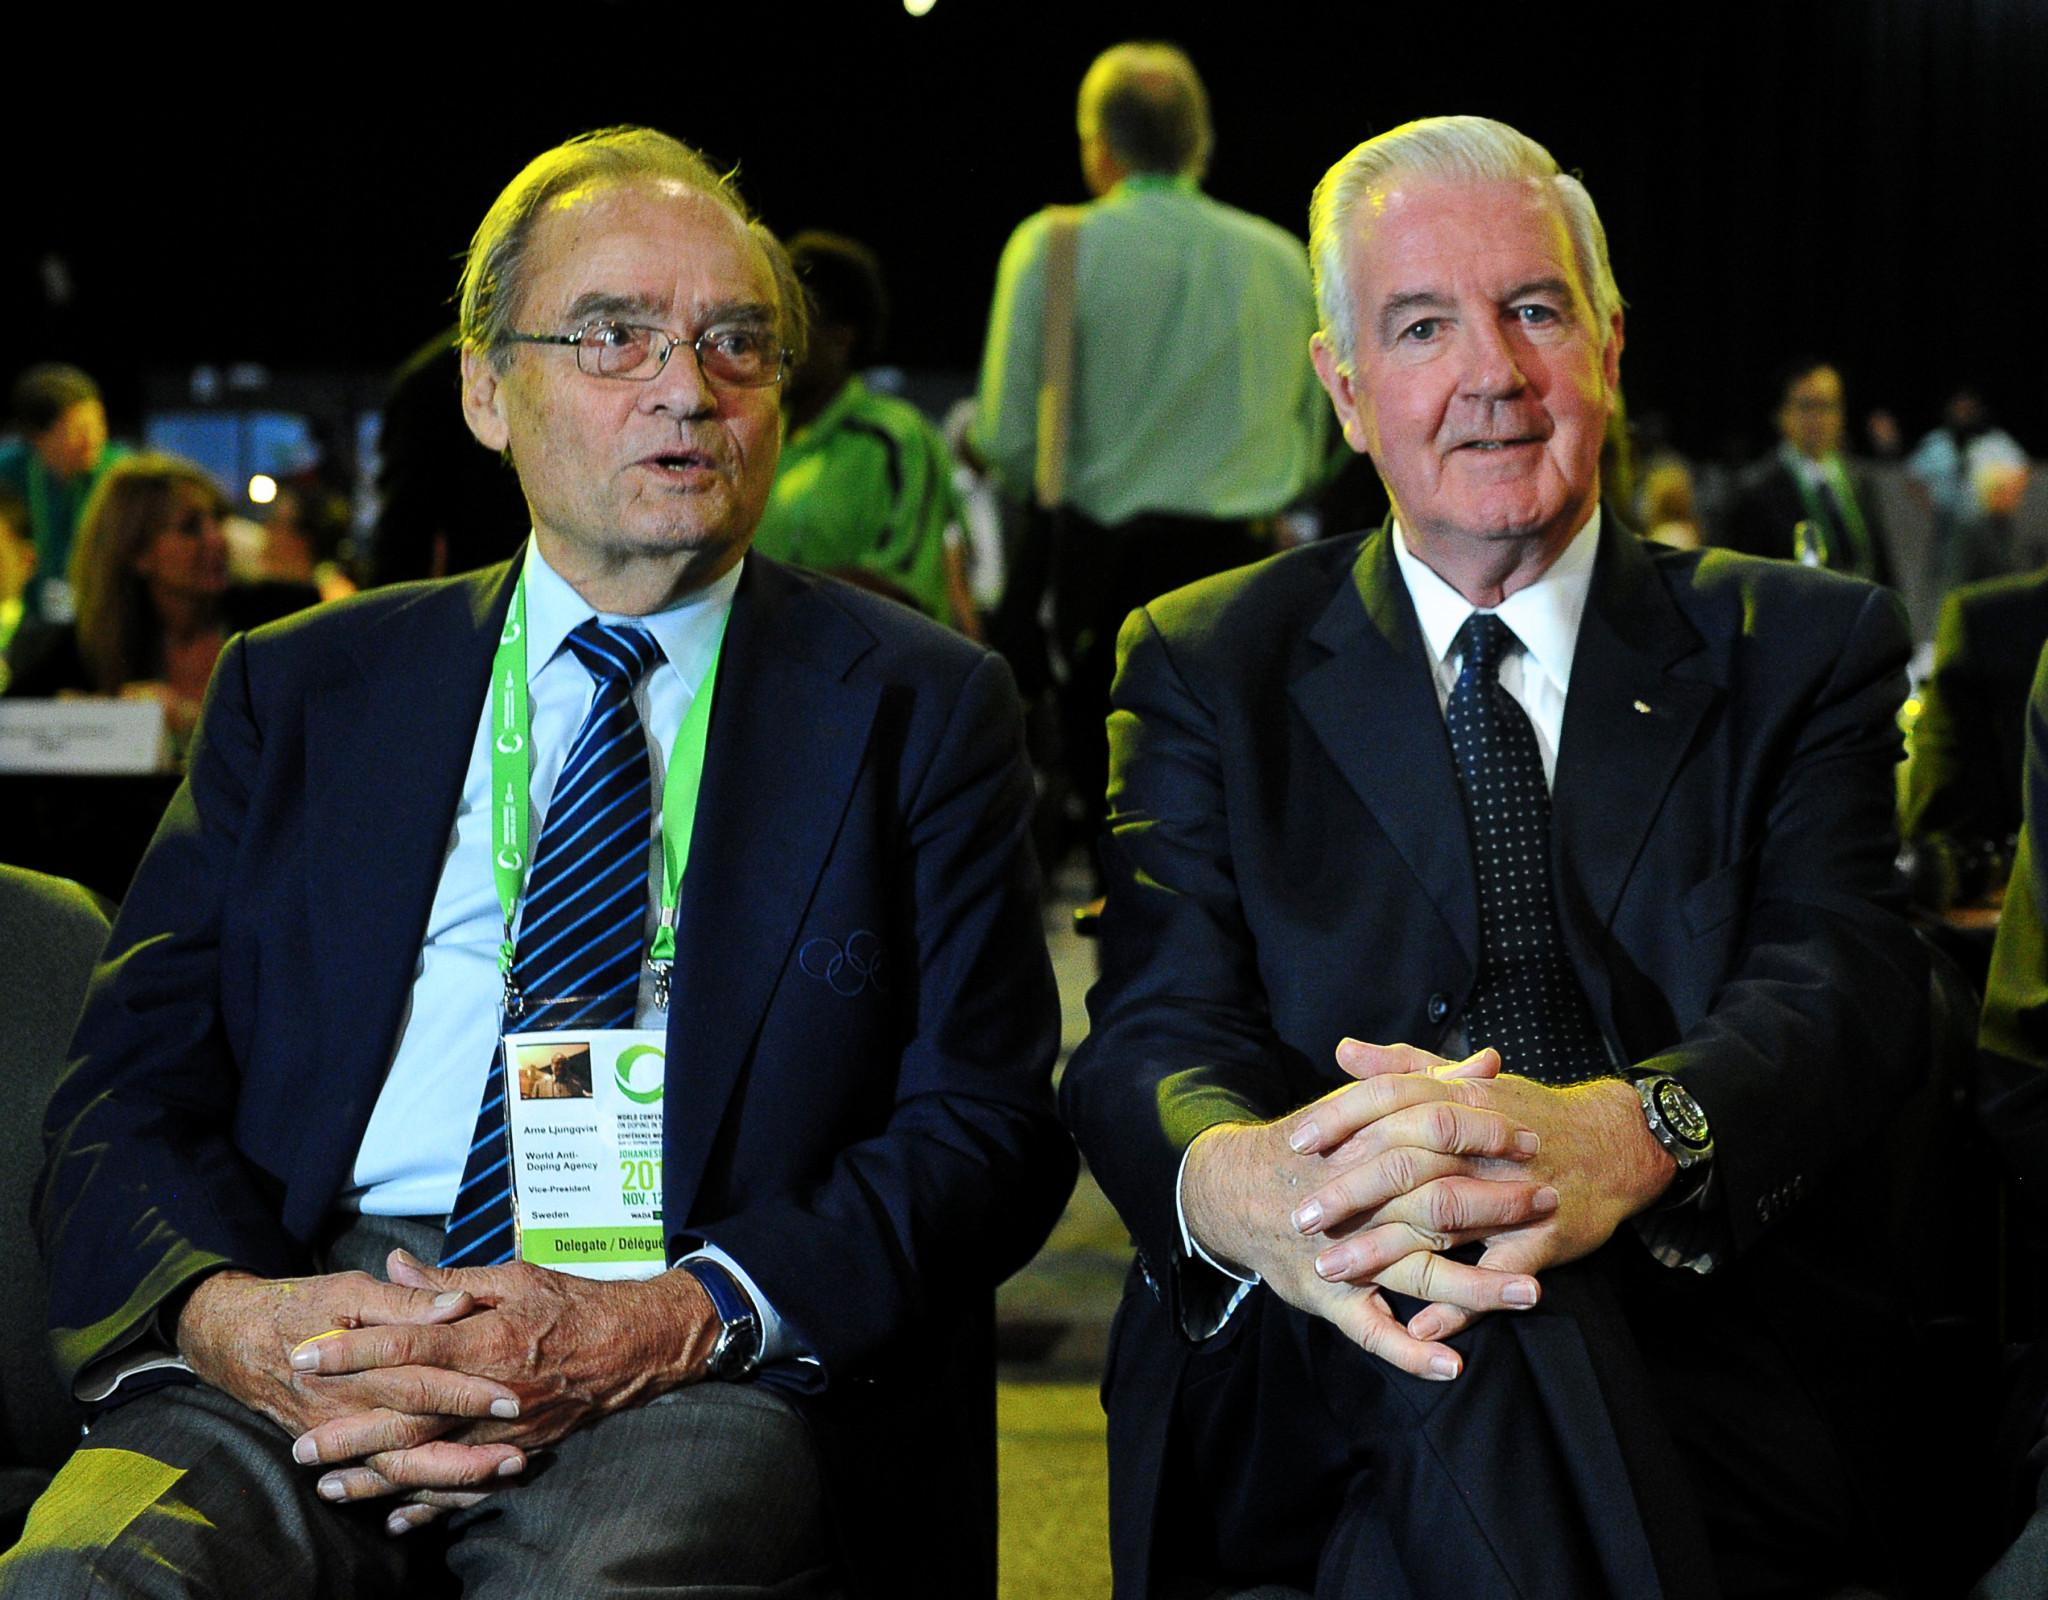 Arne Ljungqvist, left, alongside WADA President Sir Craig Reedie in 2013 ©Getty Images